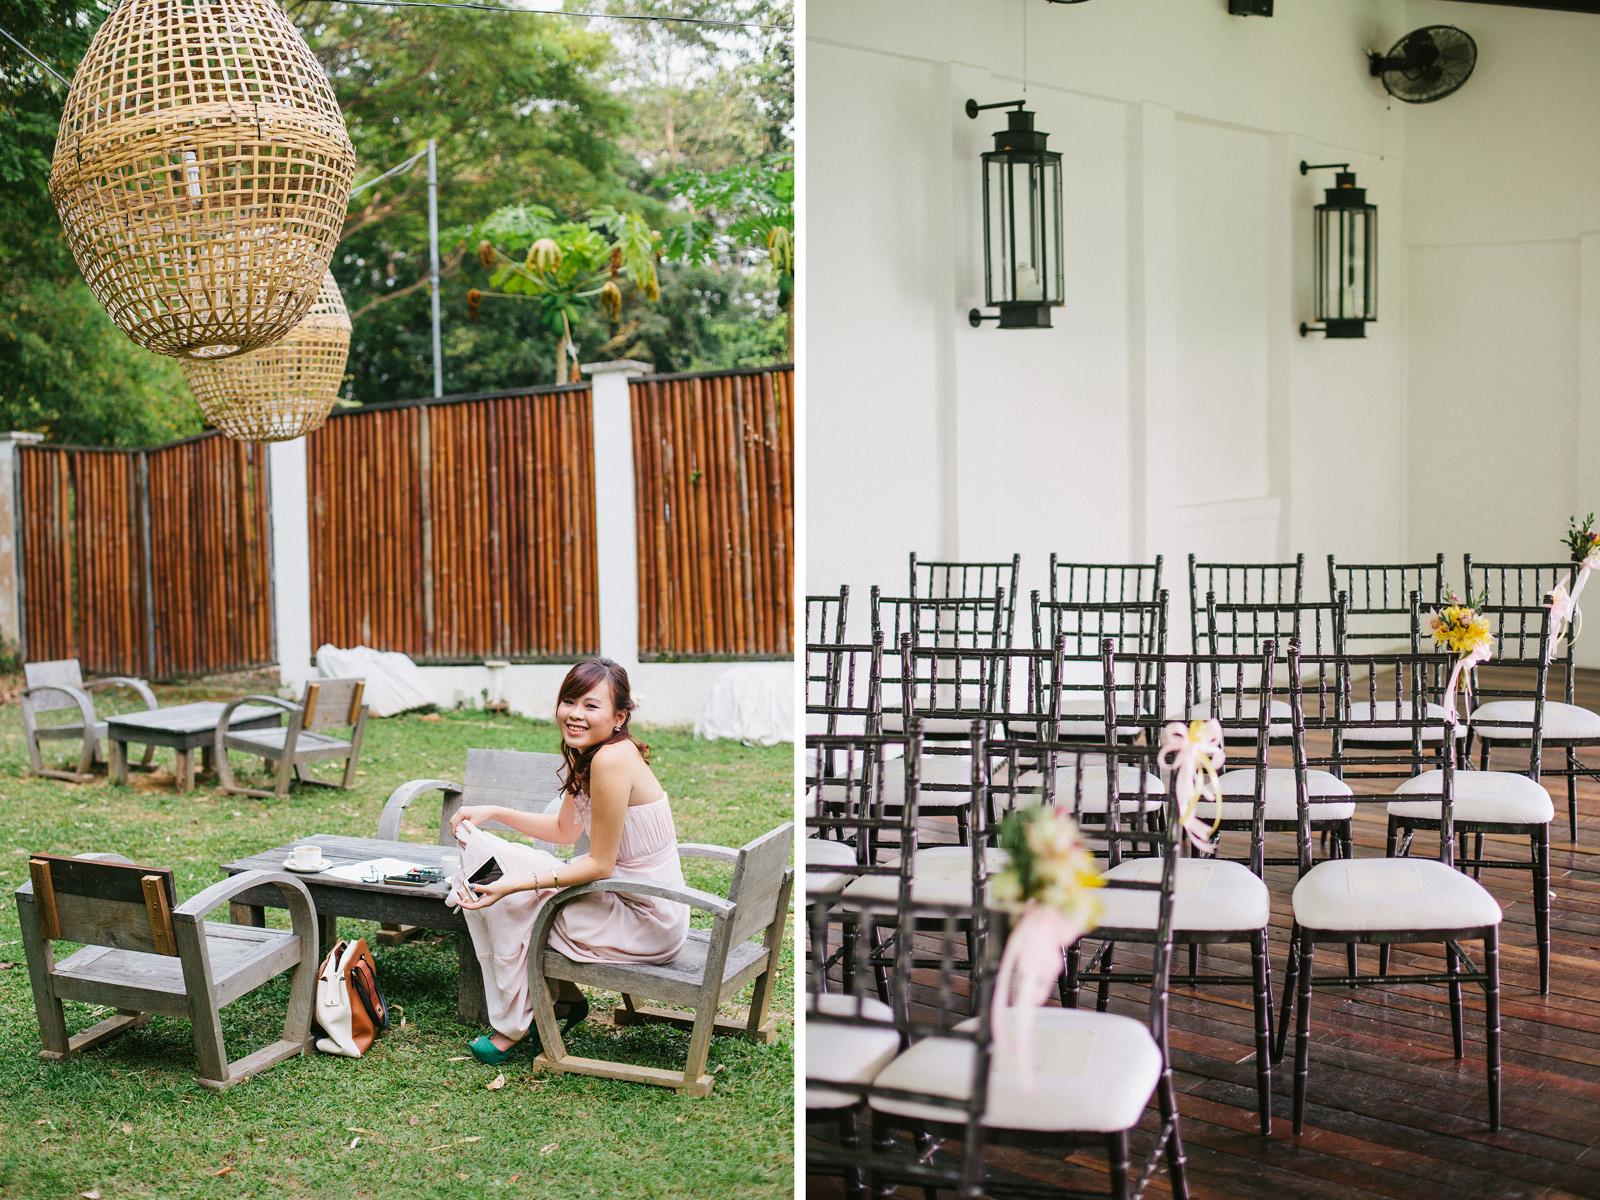 singapore-wedding-travel-photographer-faith-alvin-wedding-wmt-23.jpg